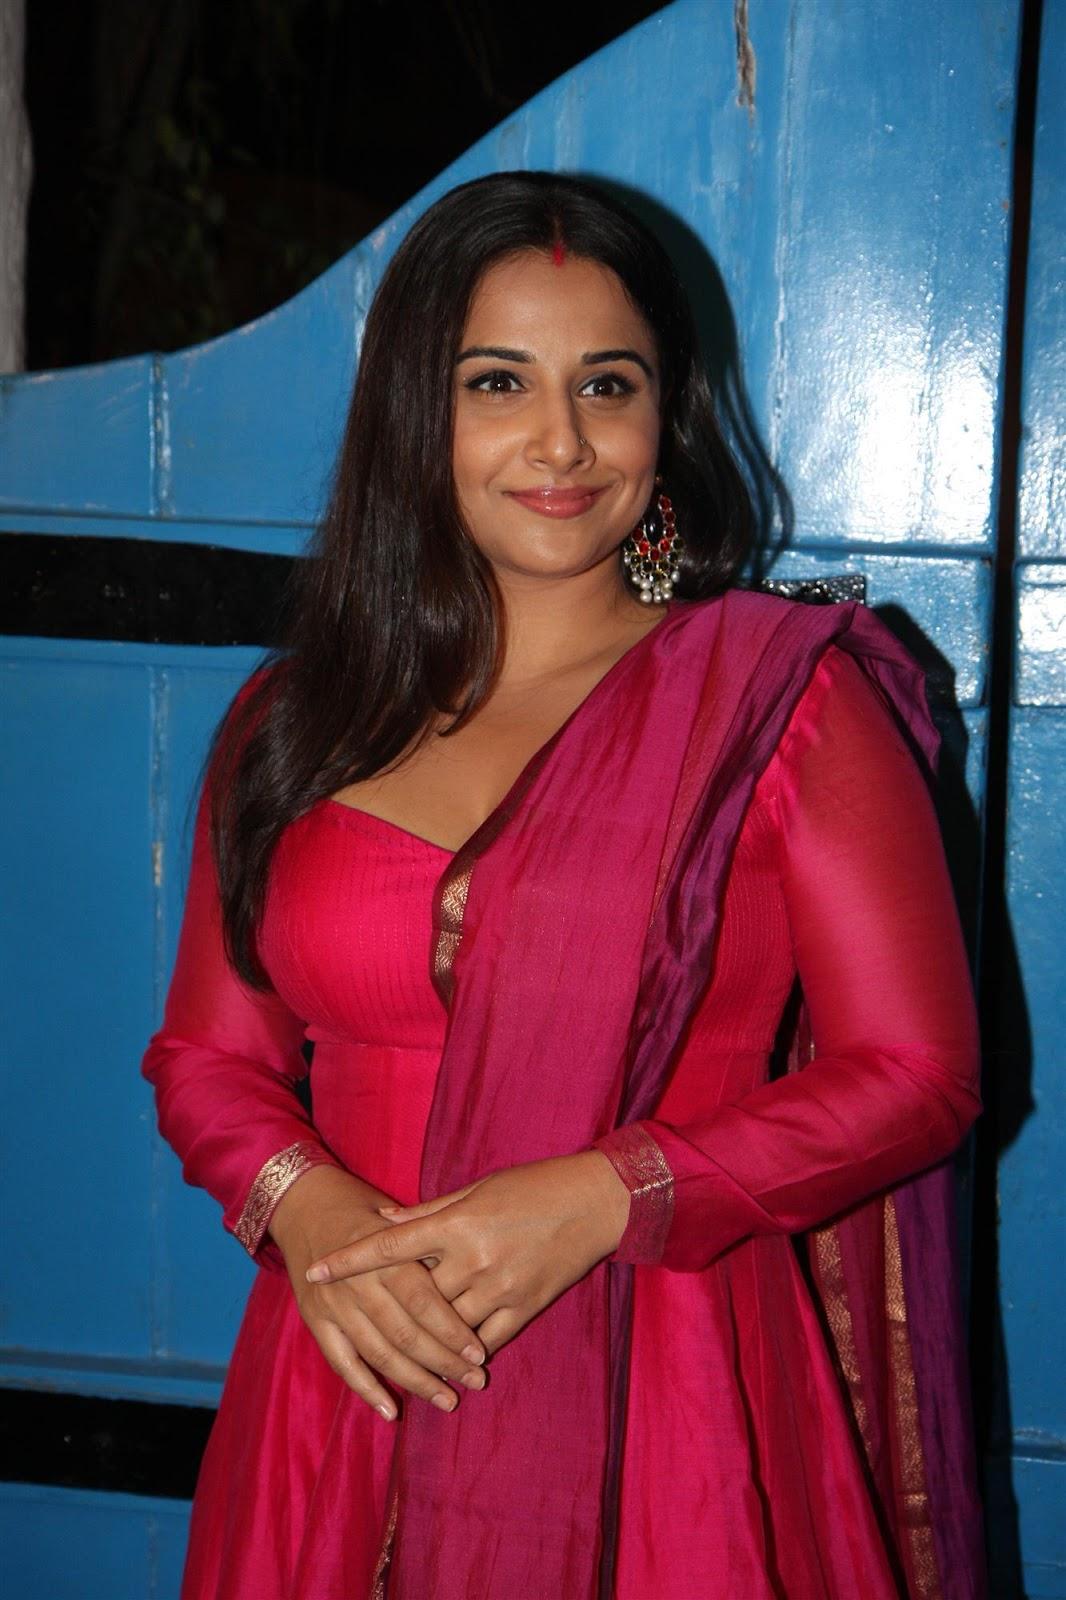 High Quality Bollywood Celebrity Pictures: Vidya Balan